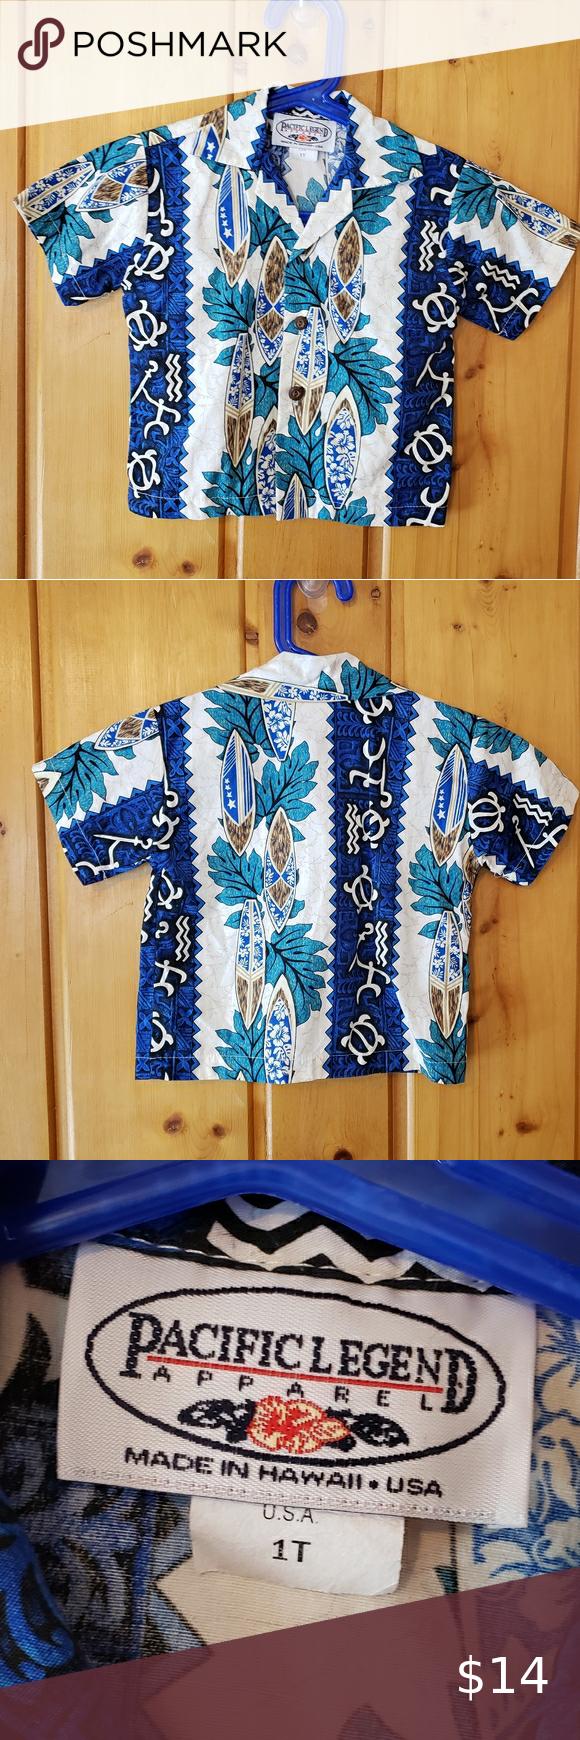 Kid's Pacific Legend Apparel Shirt